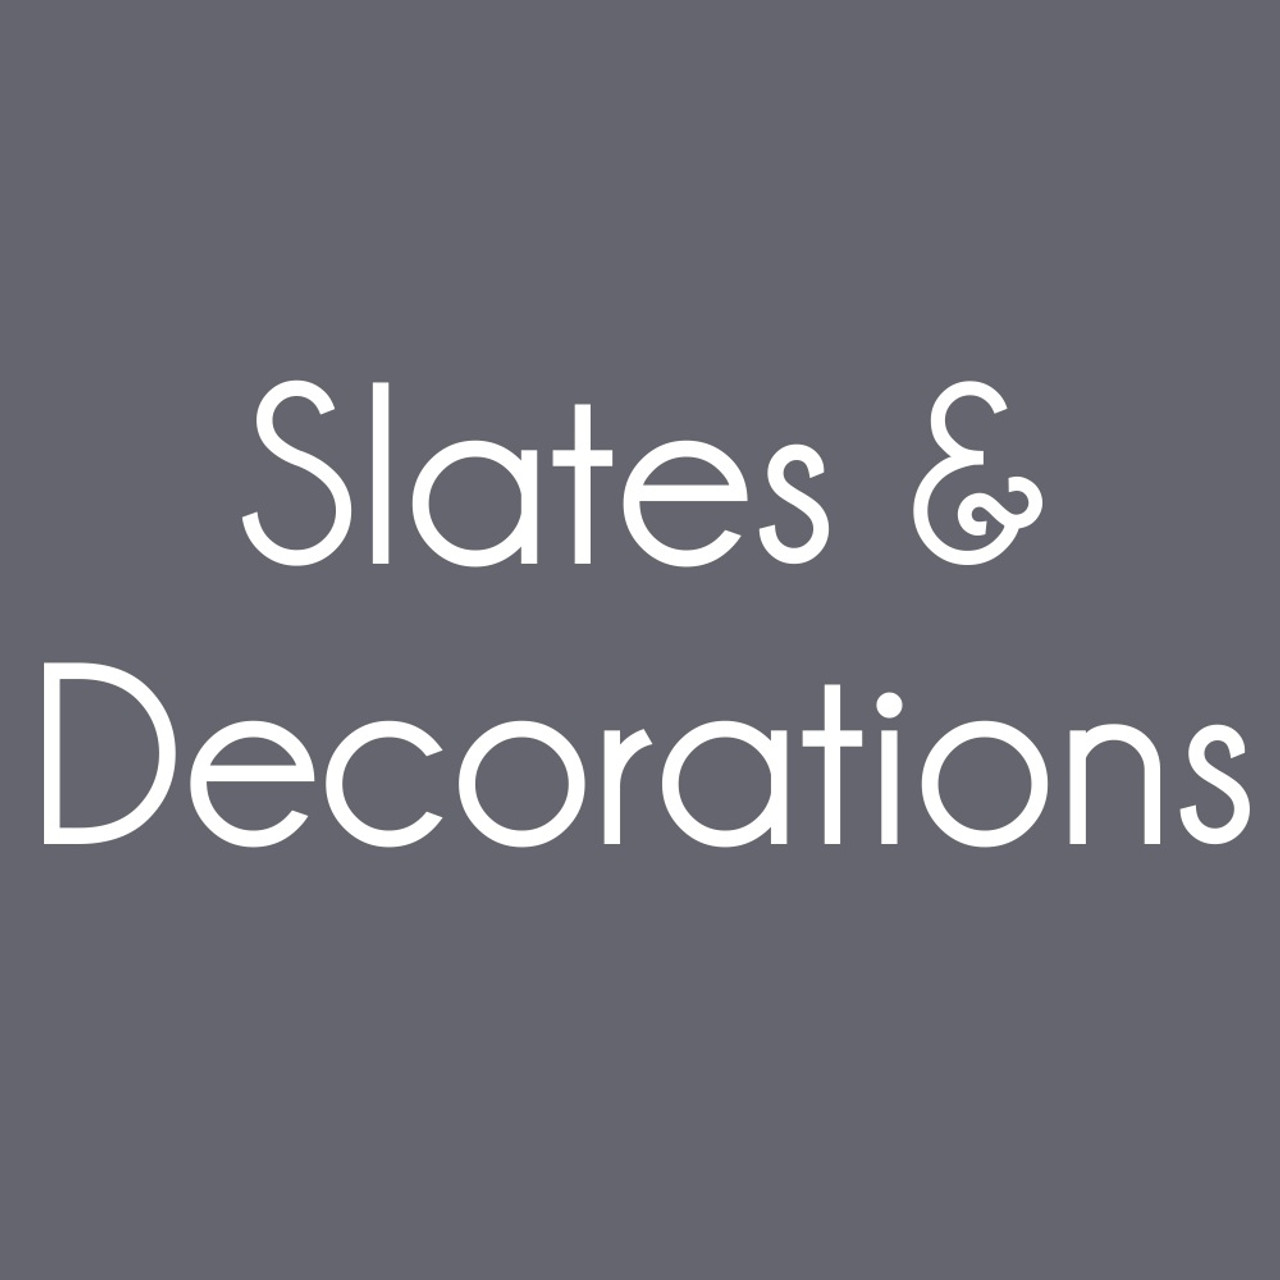 Slates & Decorations